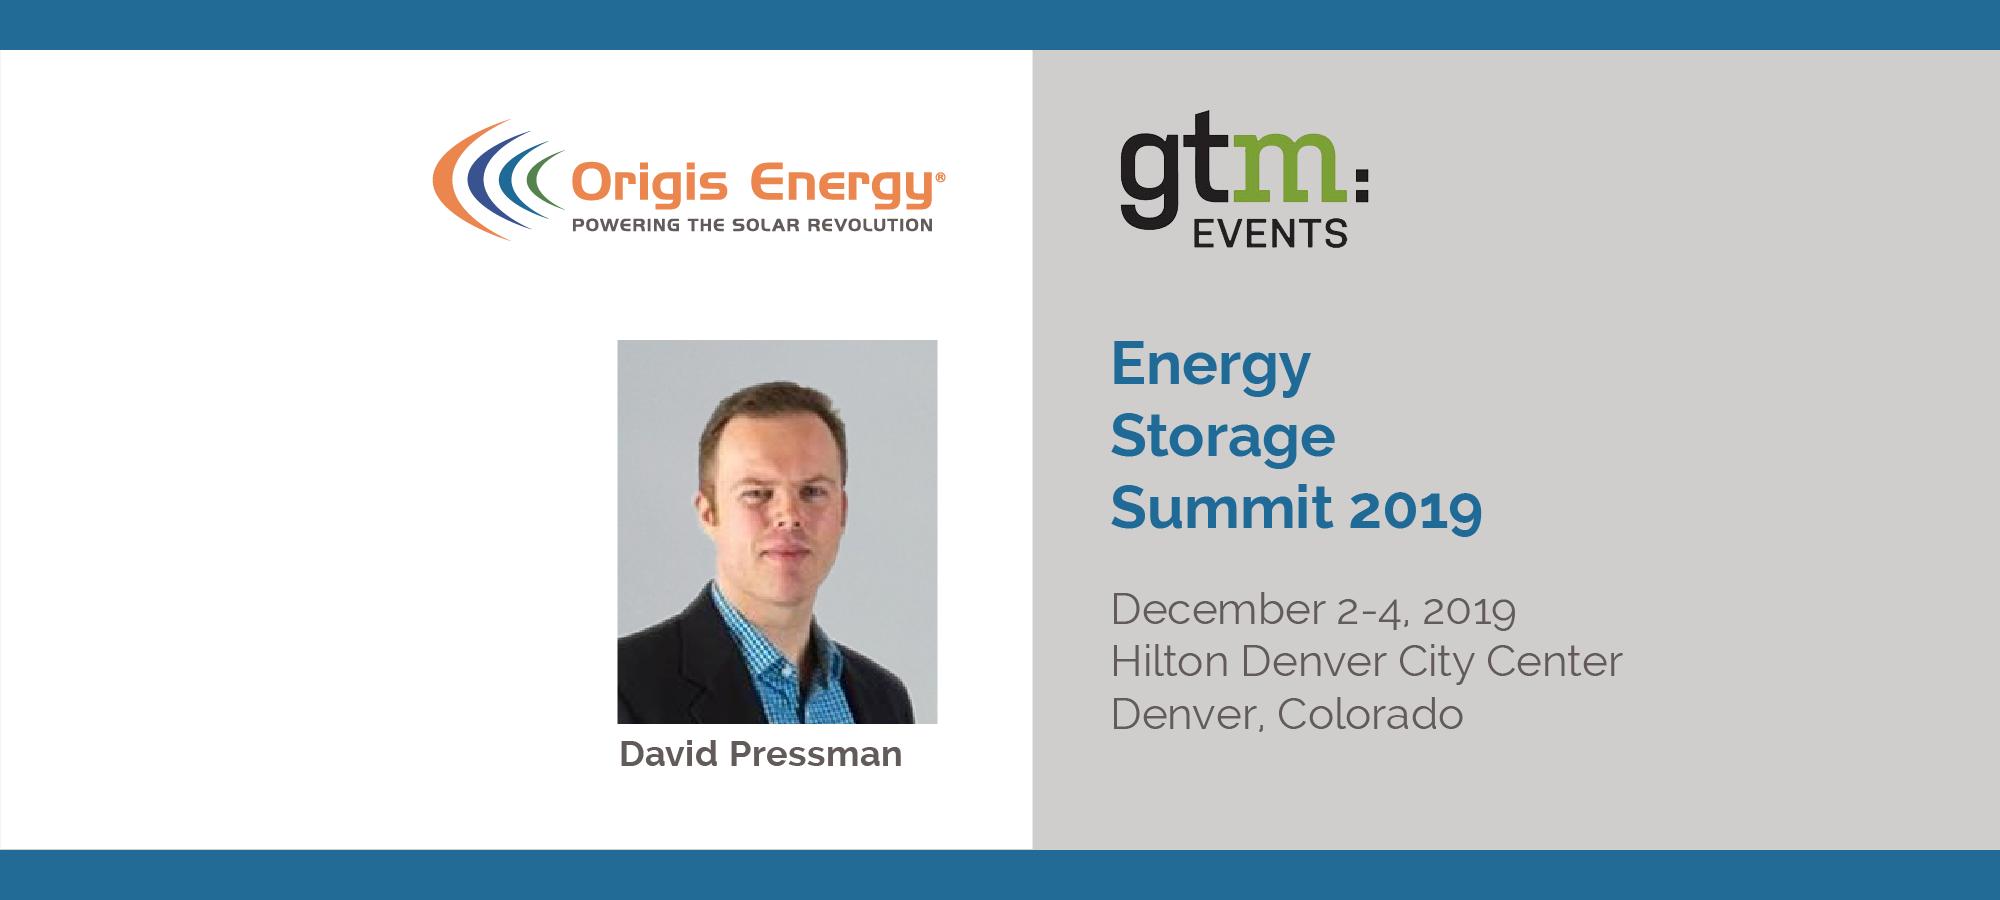 GTM Energy Storage Summit image